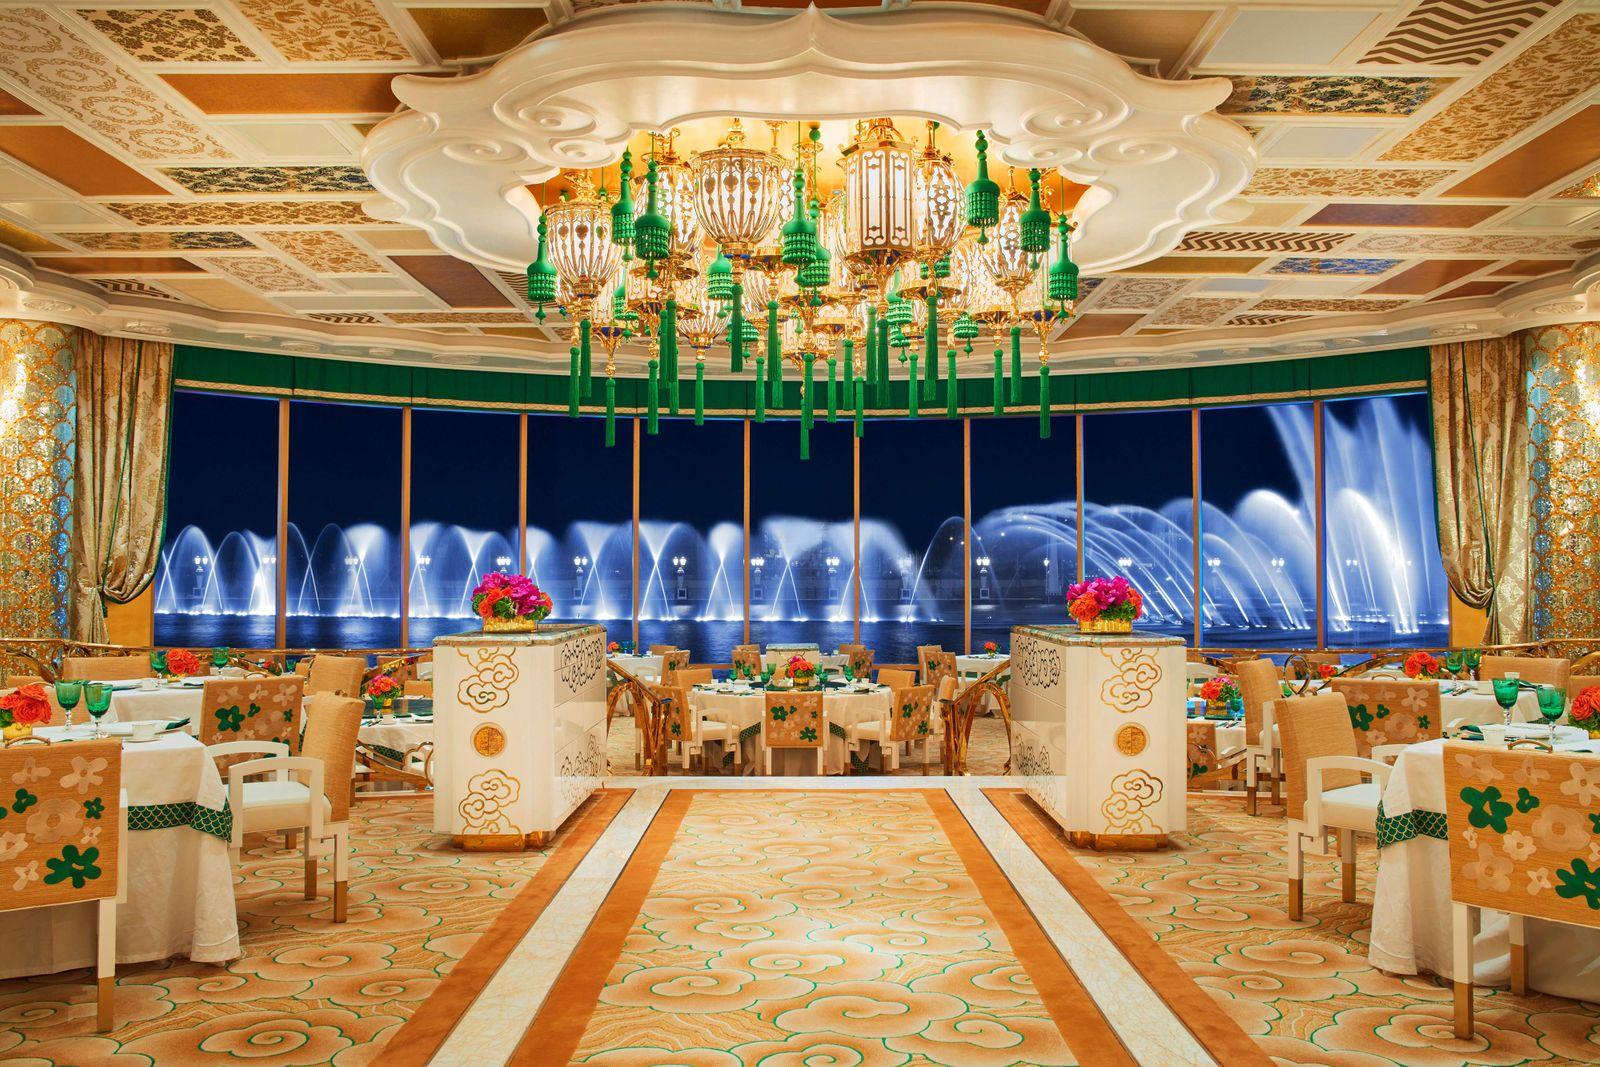 MACAU-CHINA-WYNN-GAMBLING-HOTELS-TOURISM